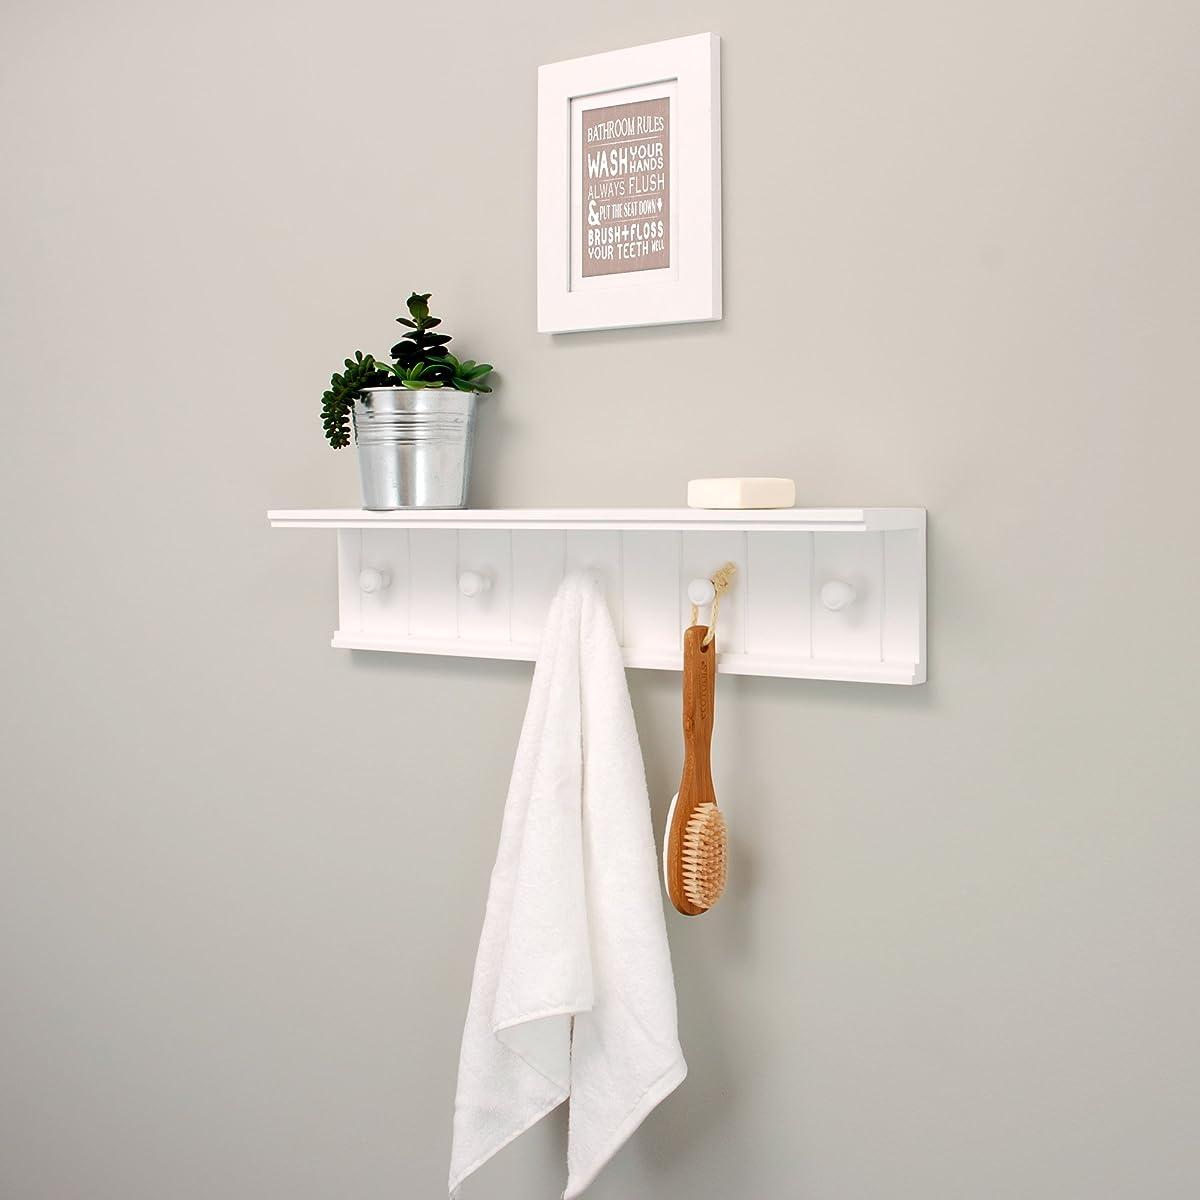 Kiera Grace Kian Wall Shelf with 5 Pegs, 24-Inch by 5-Inch, White